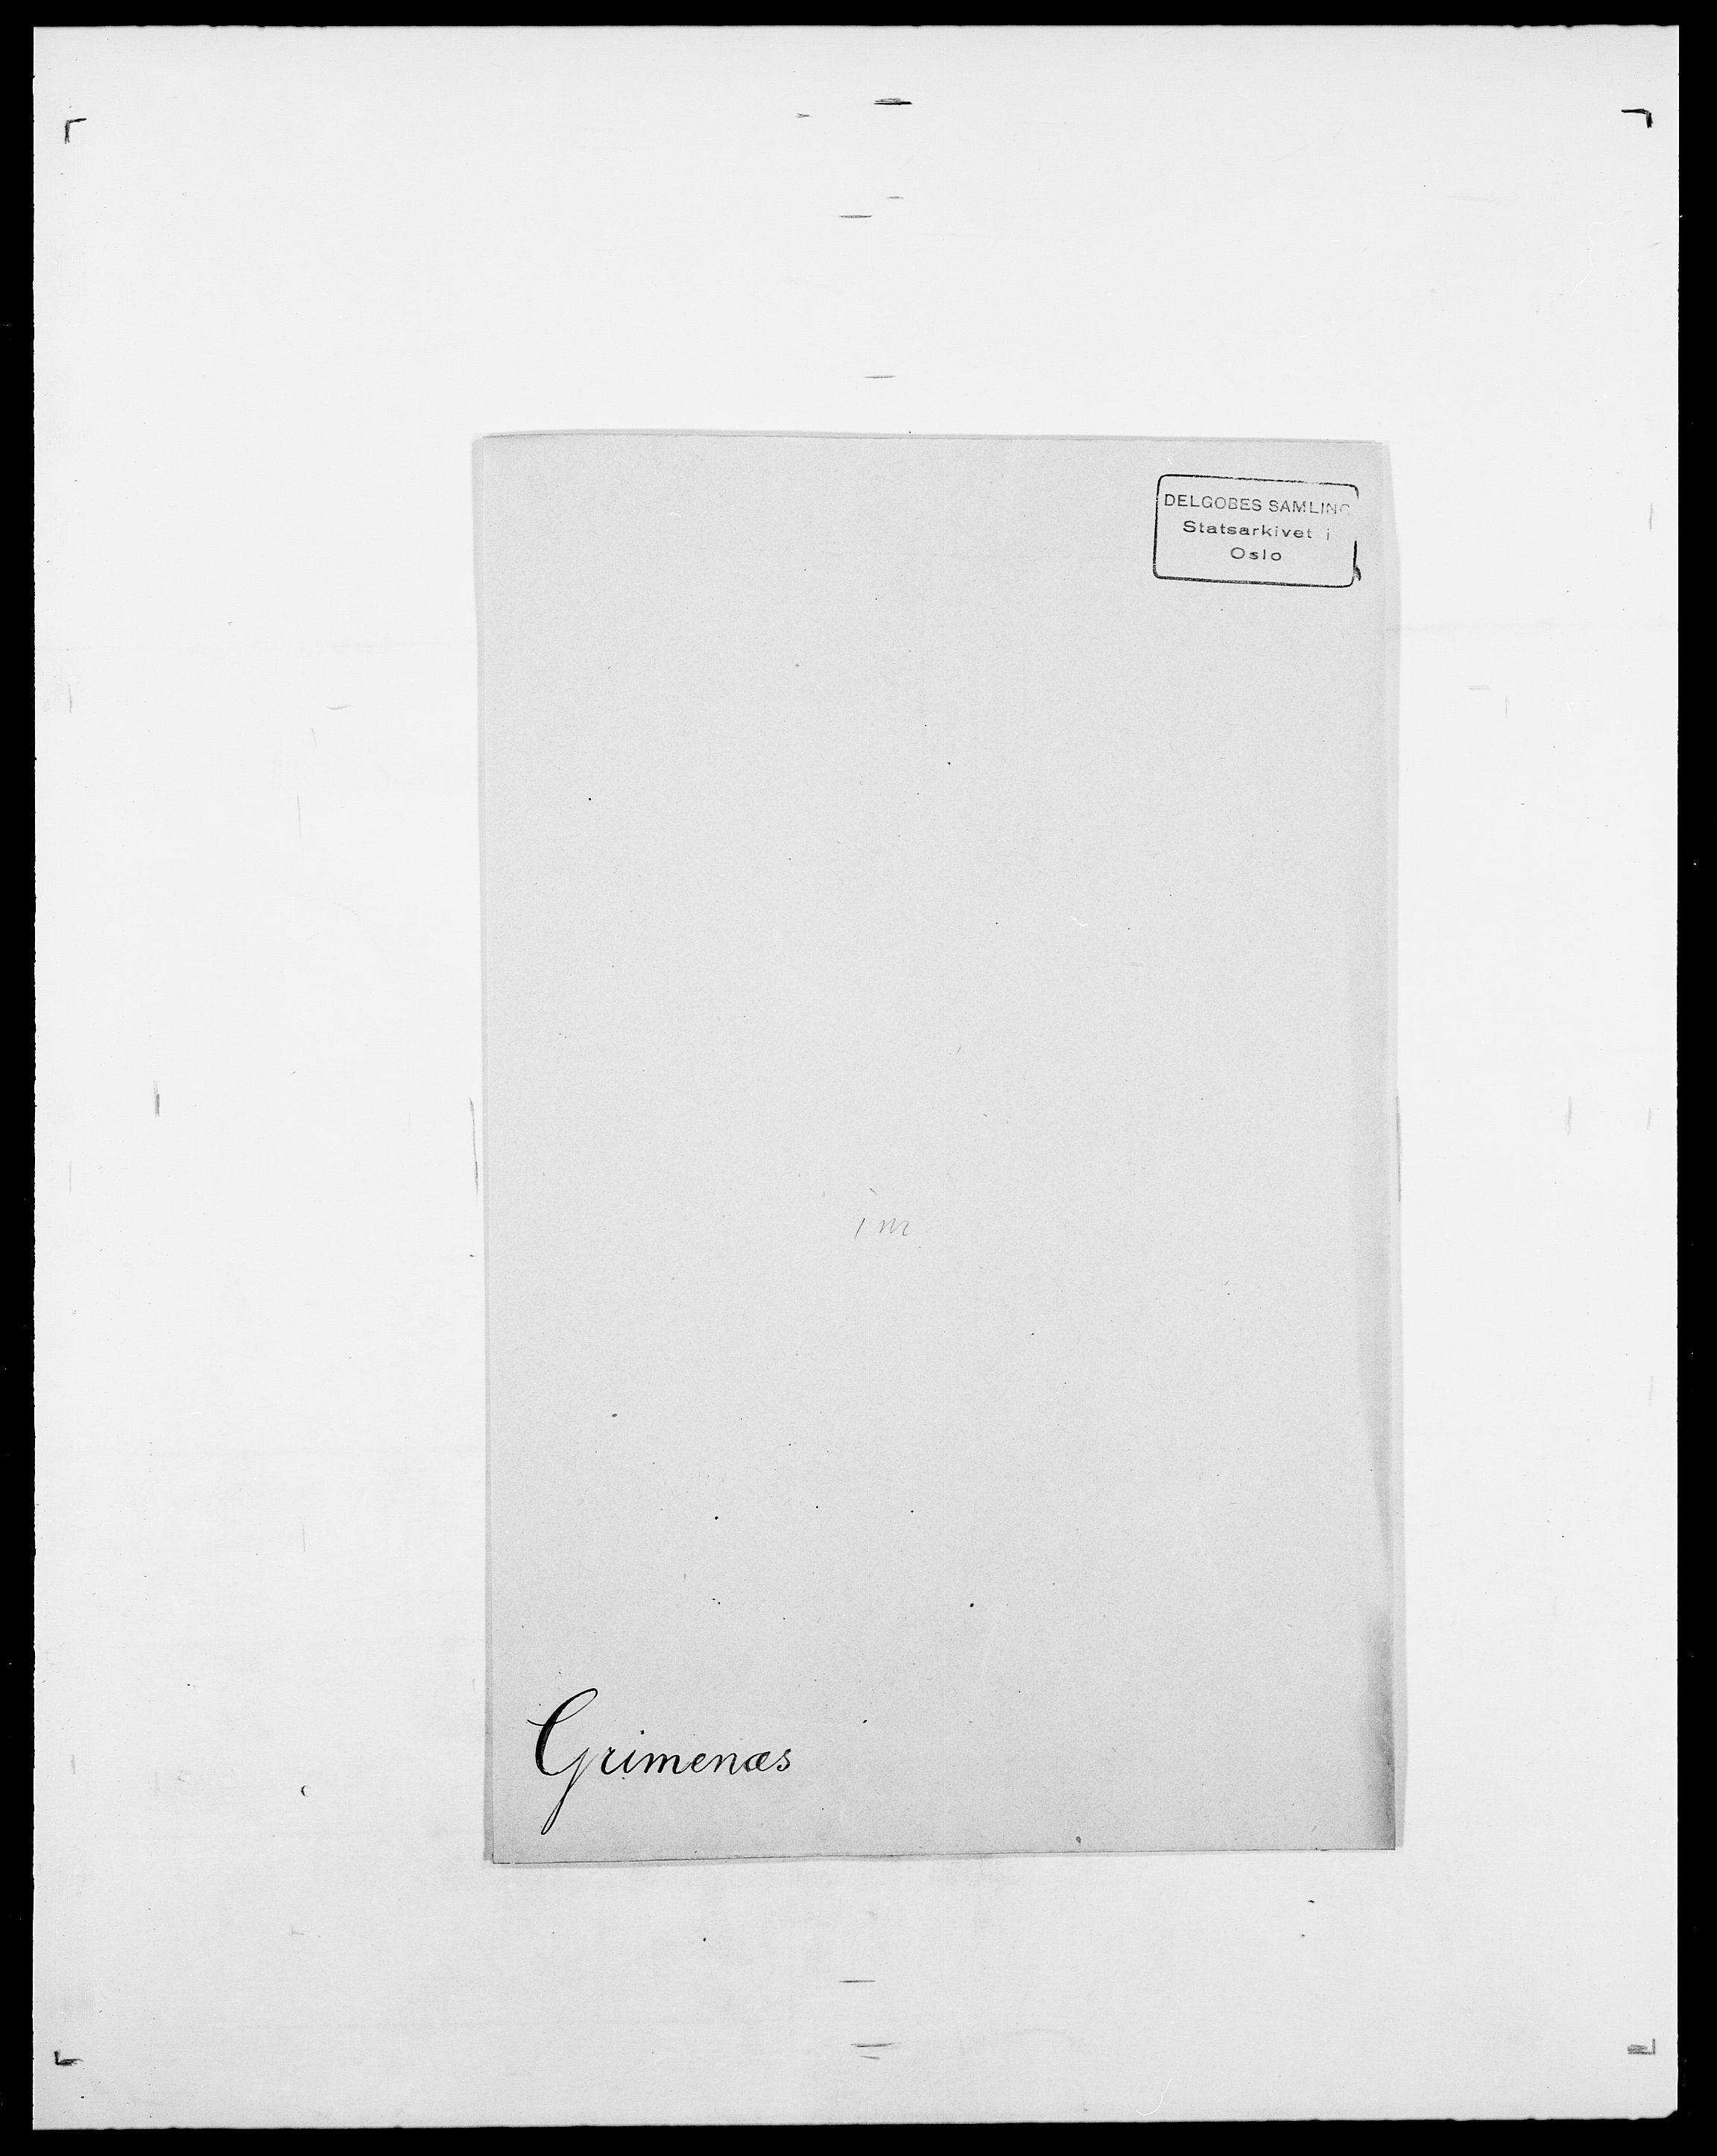 SAO, Delgobe, Charles Antoine - samling, D/Da/L0014: Giebdhausen - Grip, s. 683